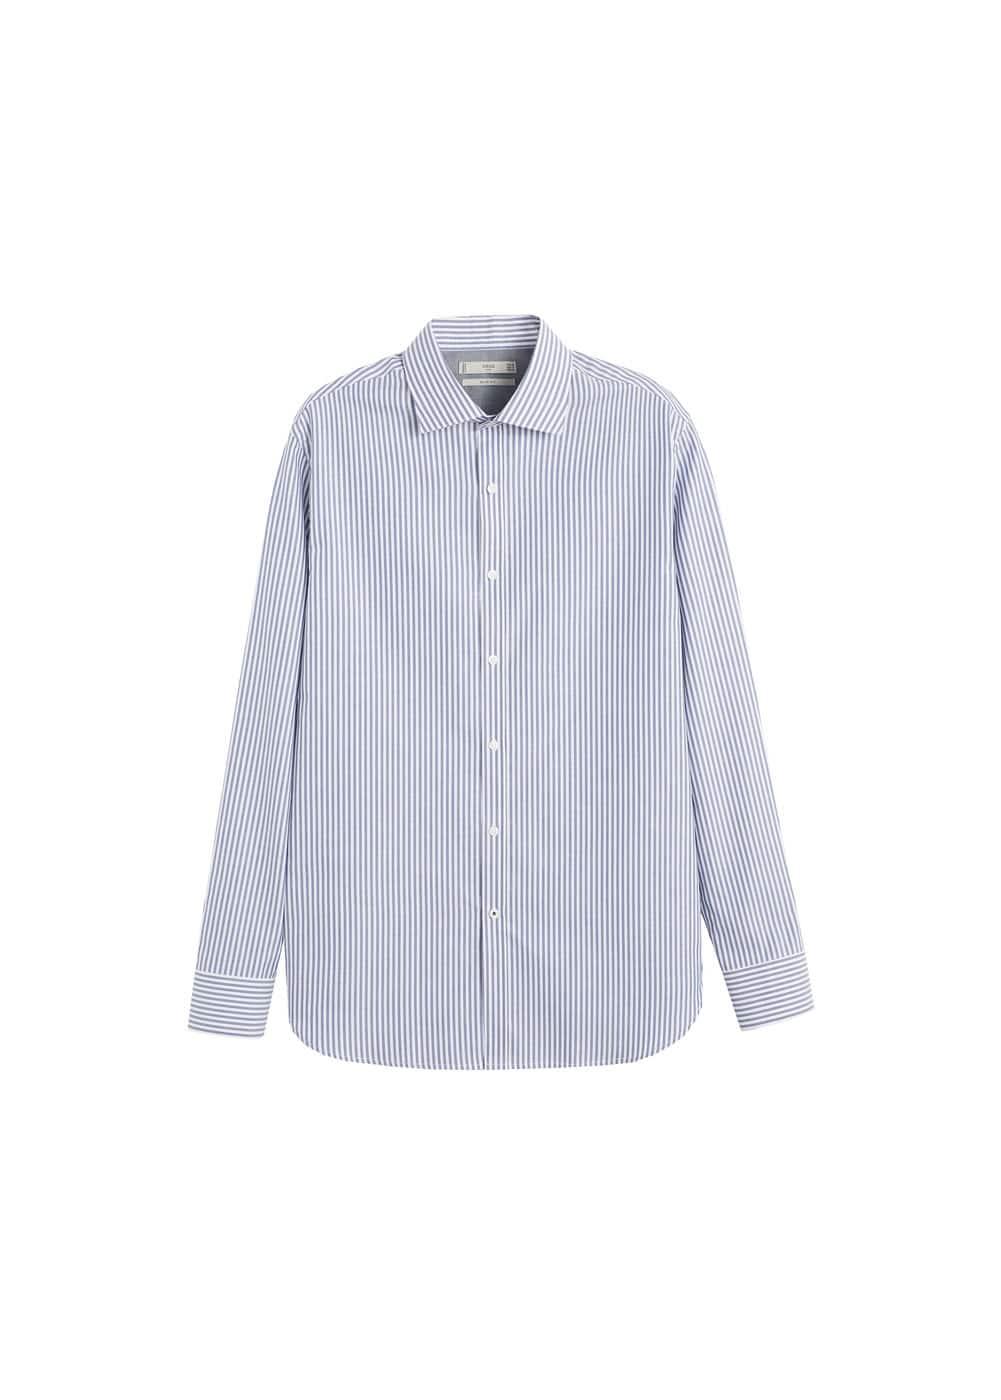 h-kodak:camisa slim fit algodon rayas